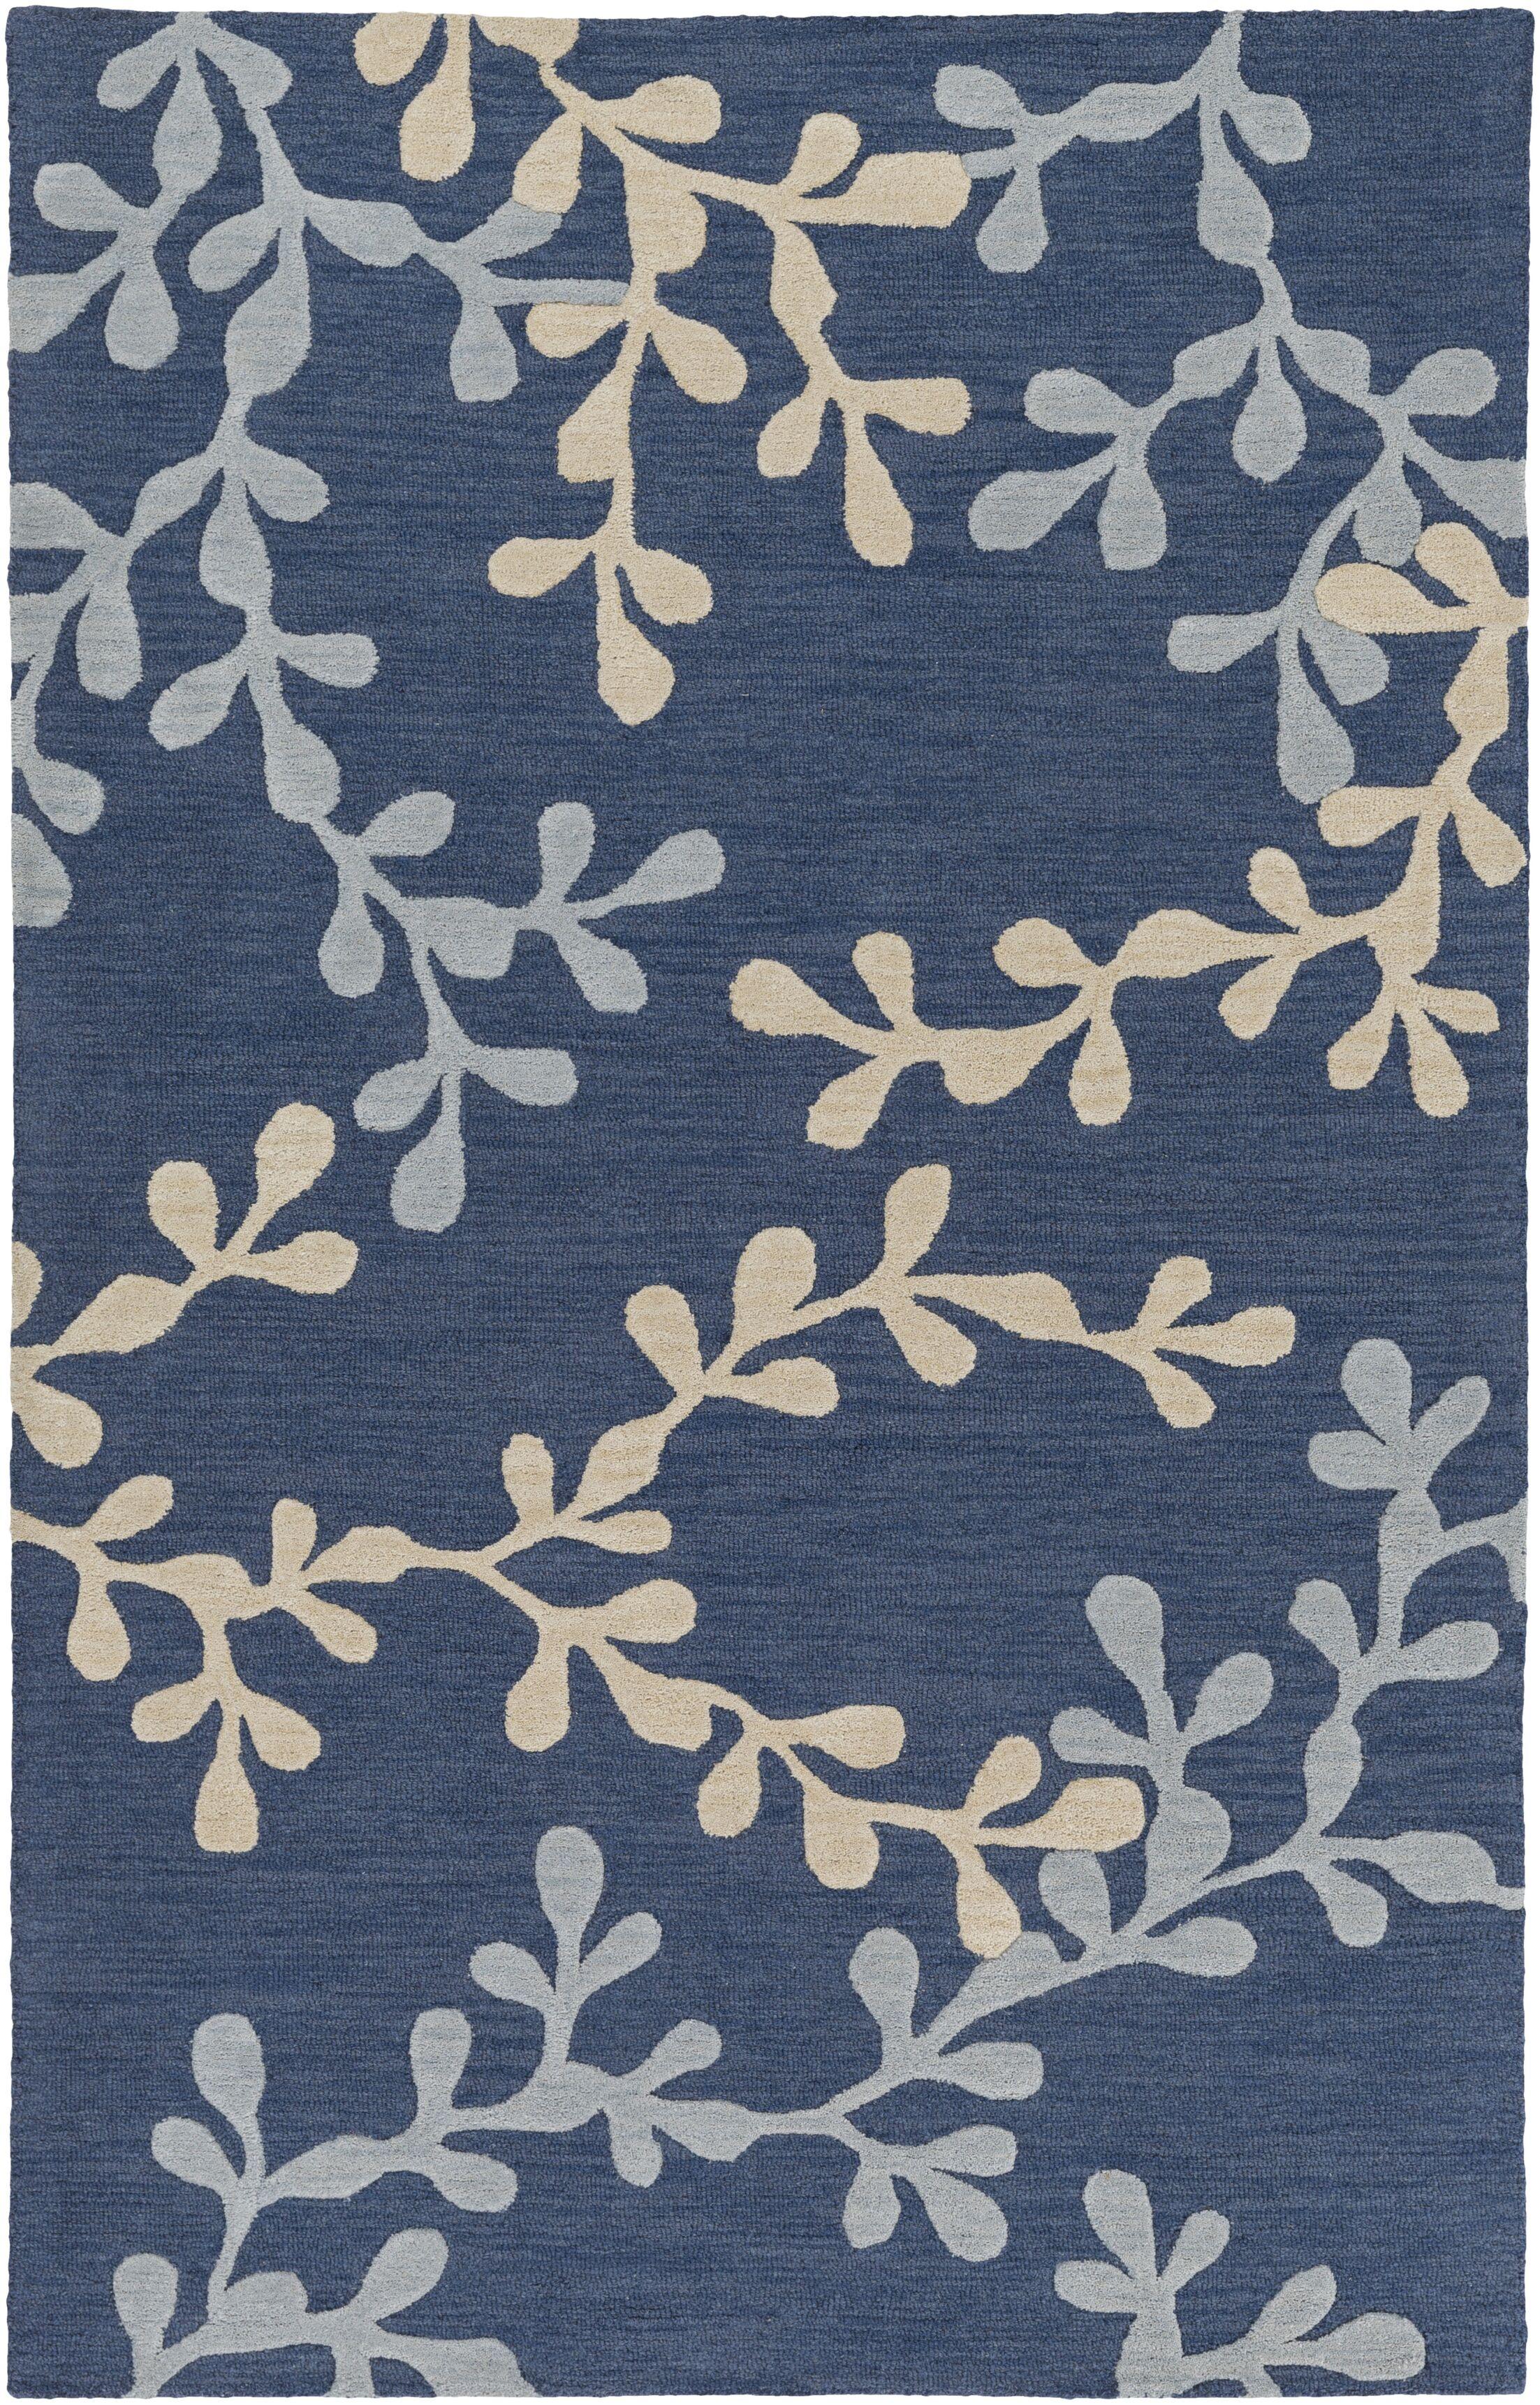 Coutu Hand-Tufted Blue/Slate Area Rug Rug Size: Rectangle 9' x 13'